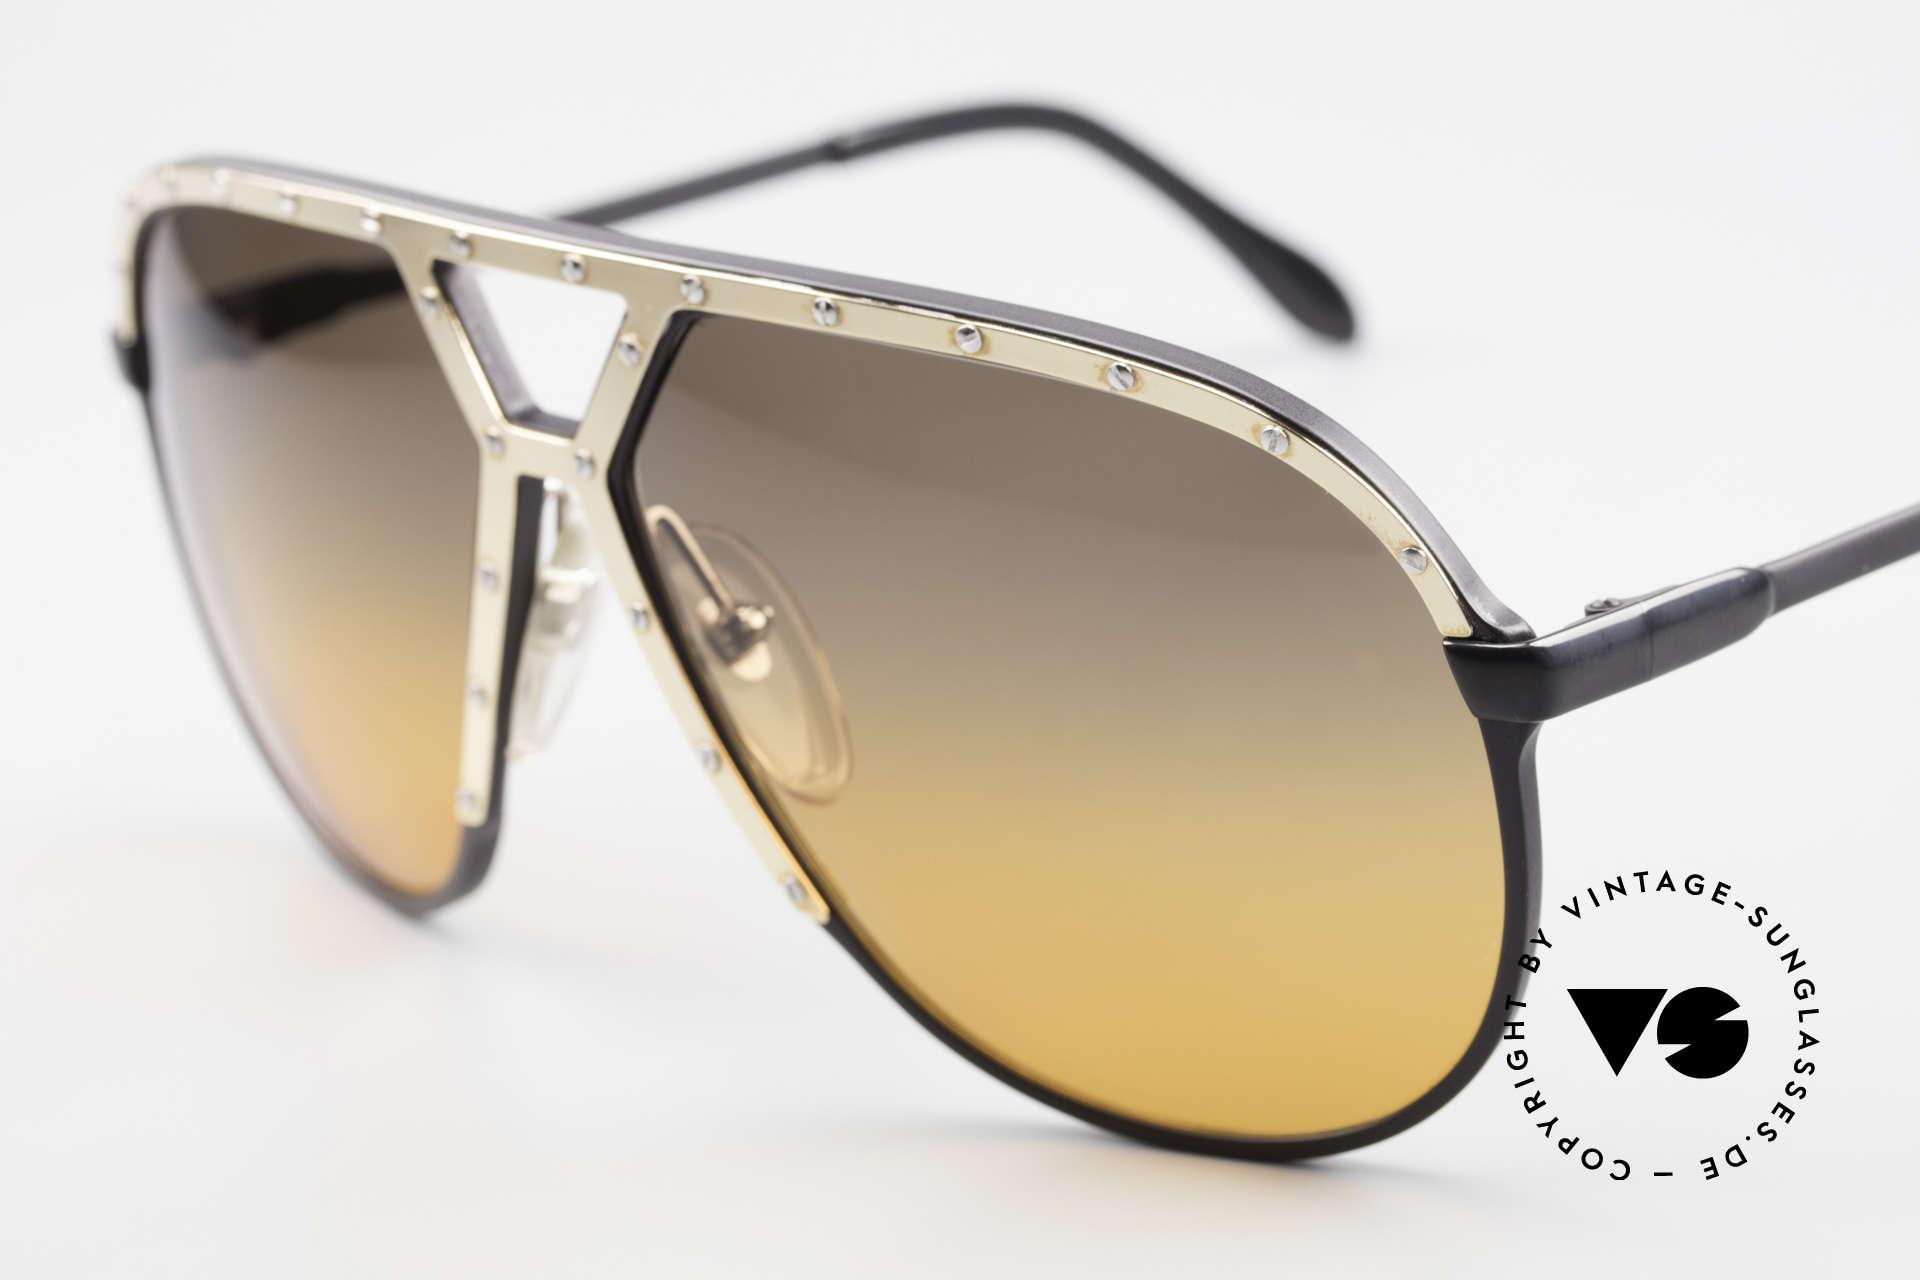 Alpina M1 80's XL Aviator Sunglasses, unique double-gradient sun lenses 'desert storm', Made for Men